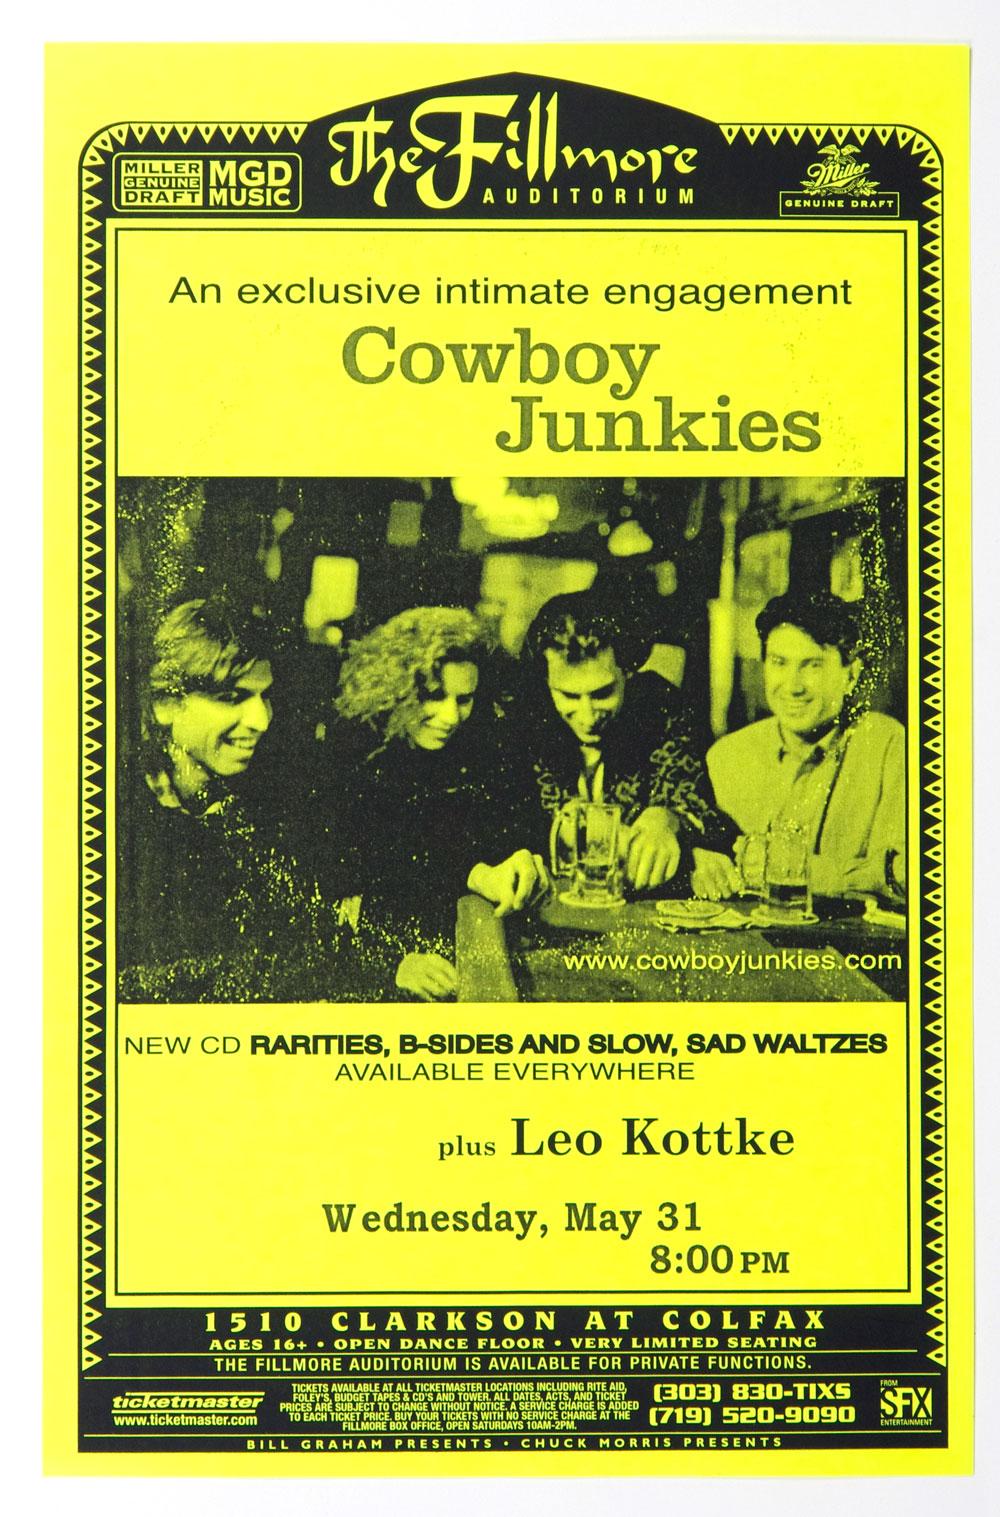 Cowboy Junkies Poster w/ Leo Kottke 1999 May 31 The Fillmore